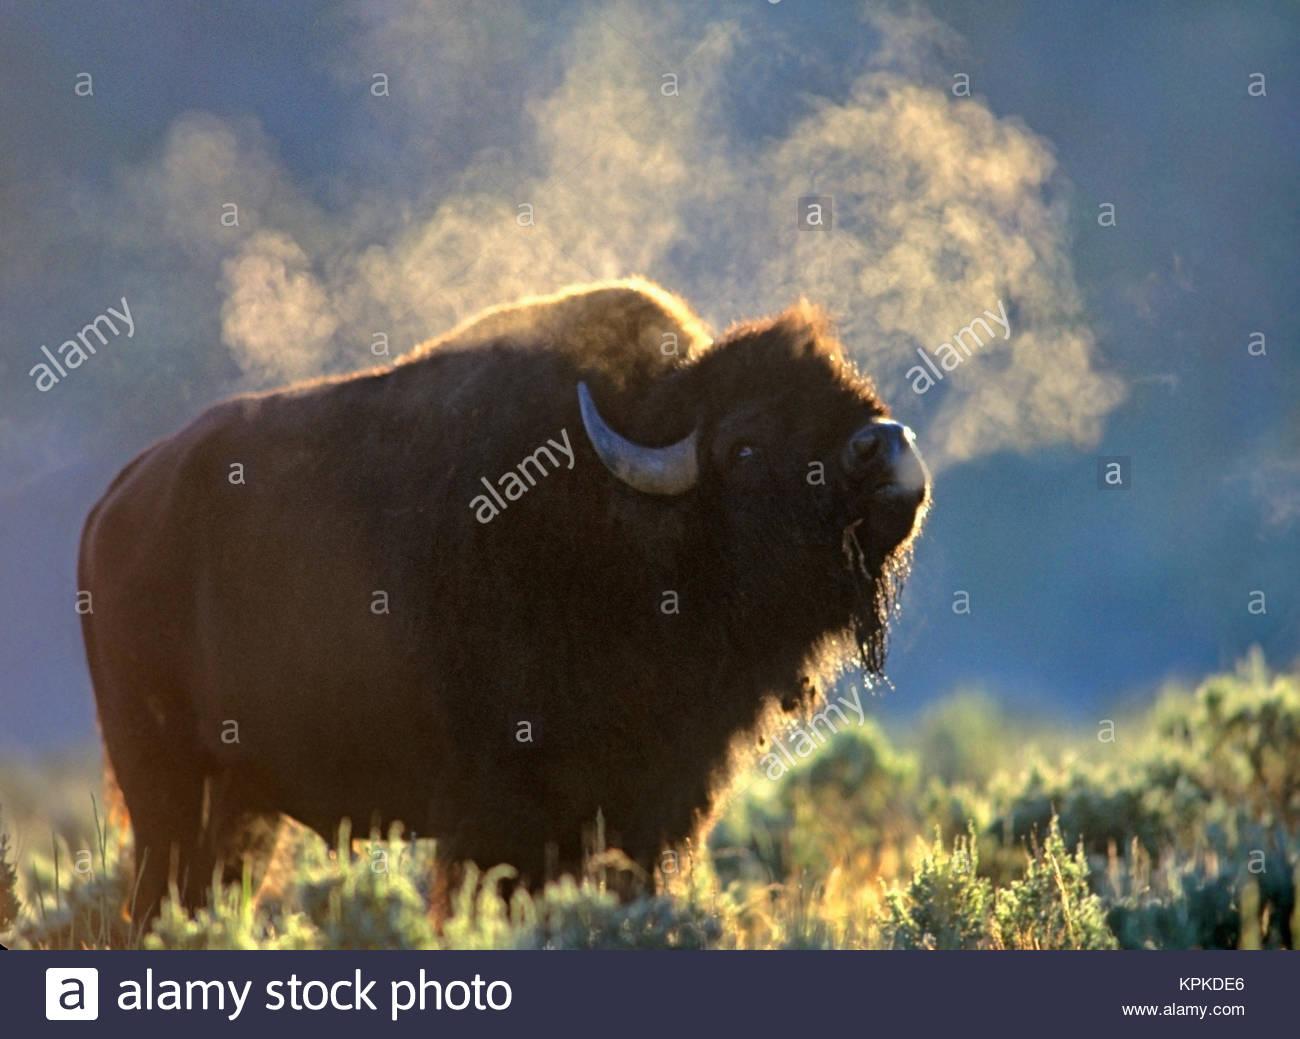 Bison (Bison bison) bellows in the morning, Wyoming, USA - Stock Image